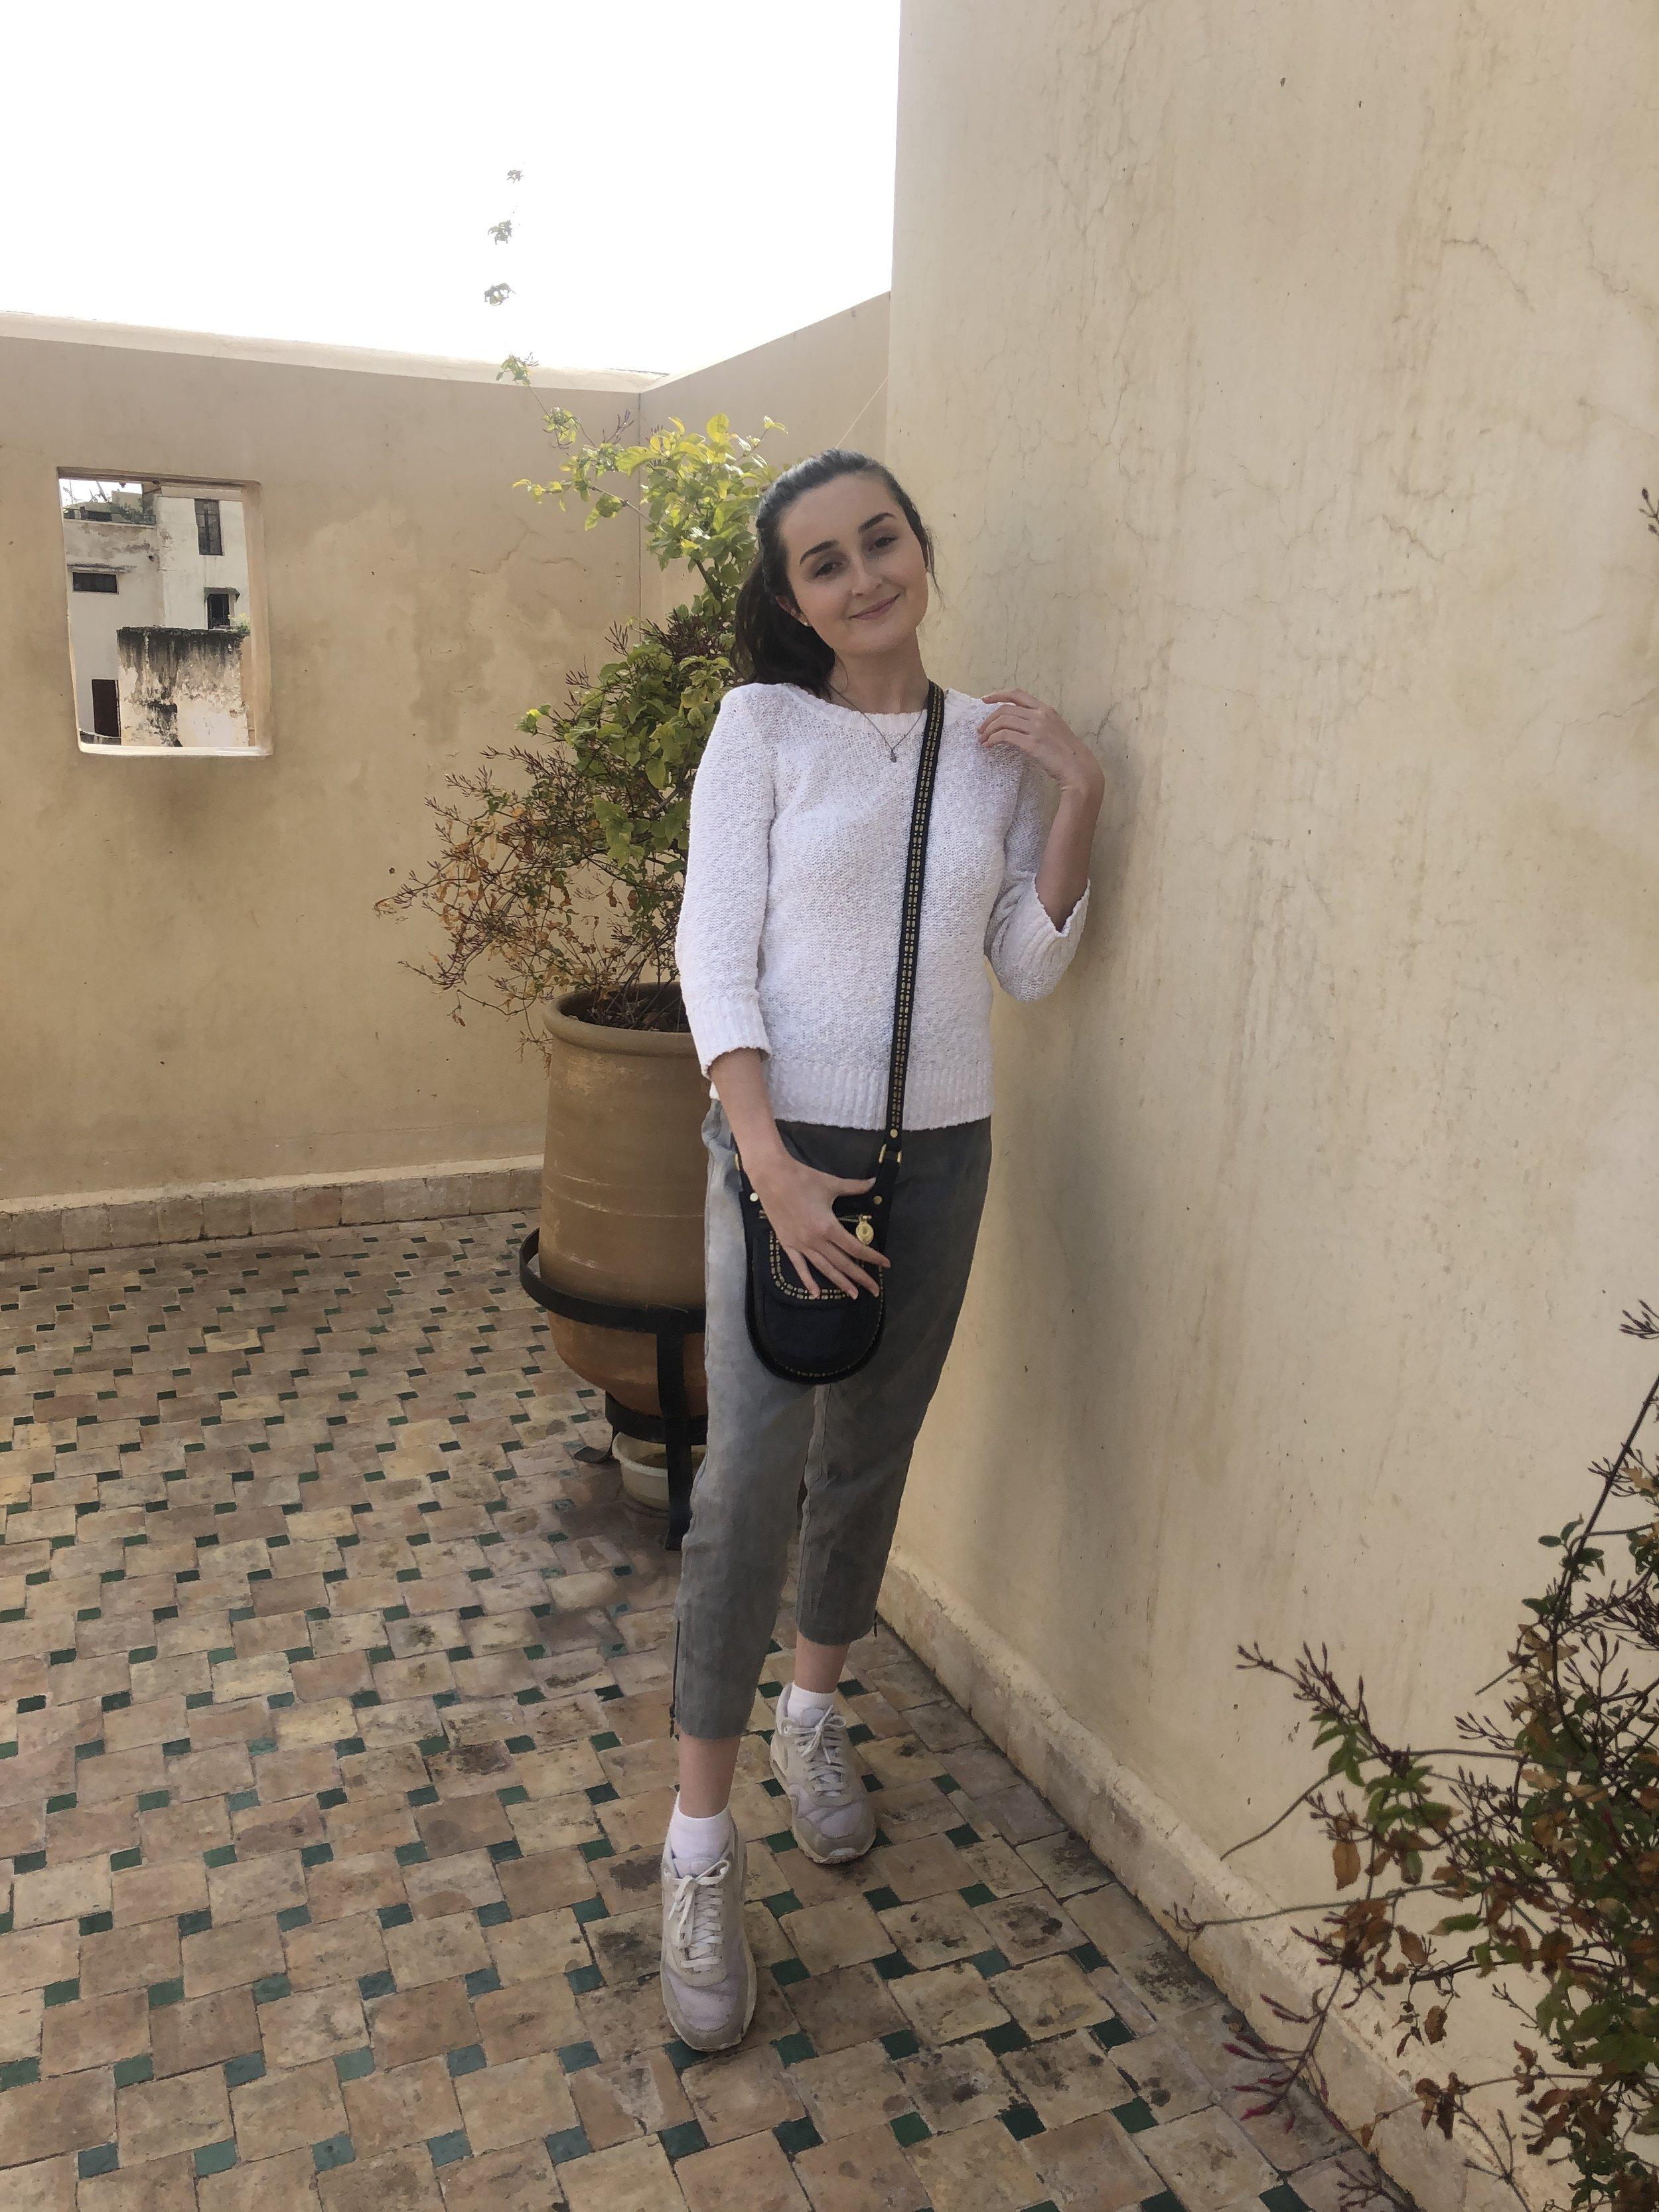 Sara in Morocco. Photo credit: Micare, 2019